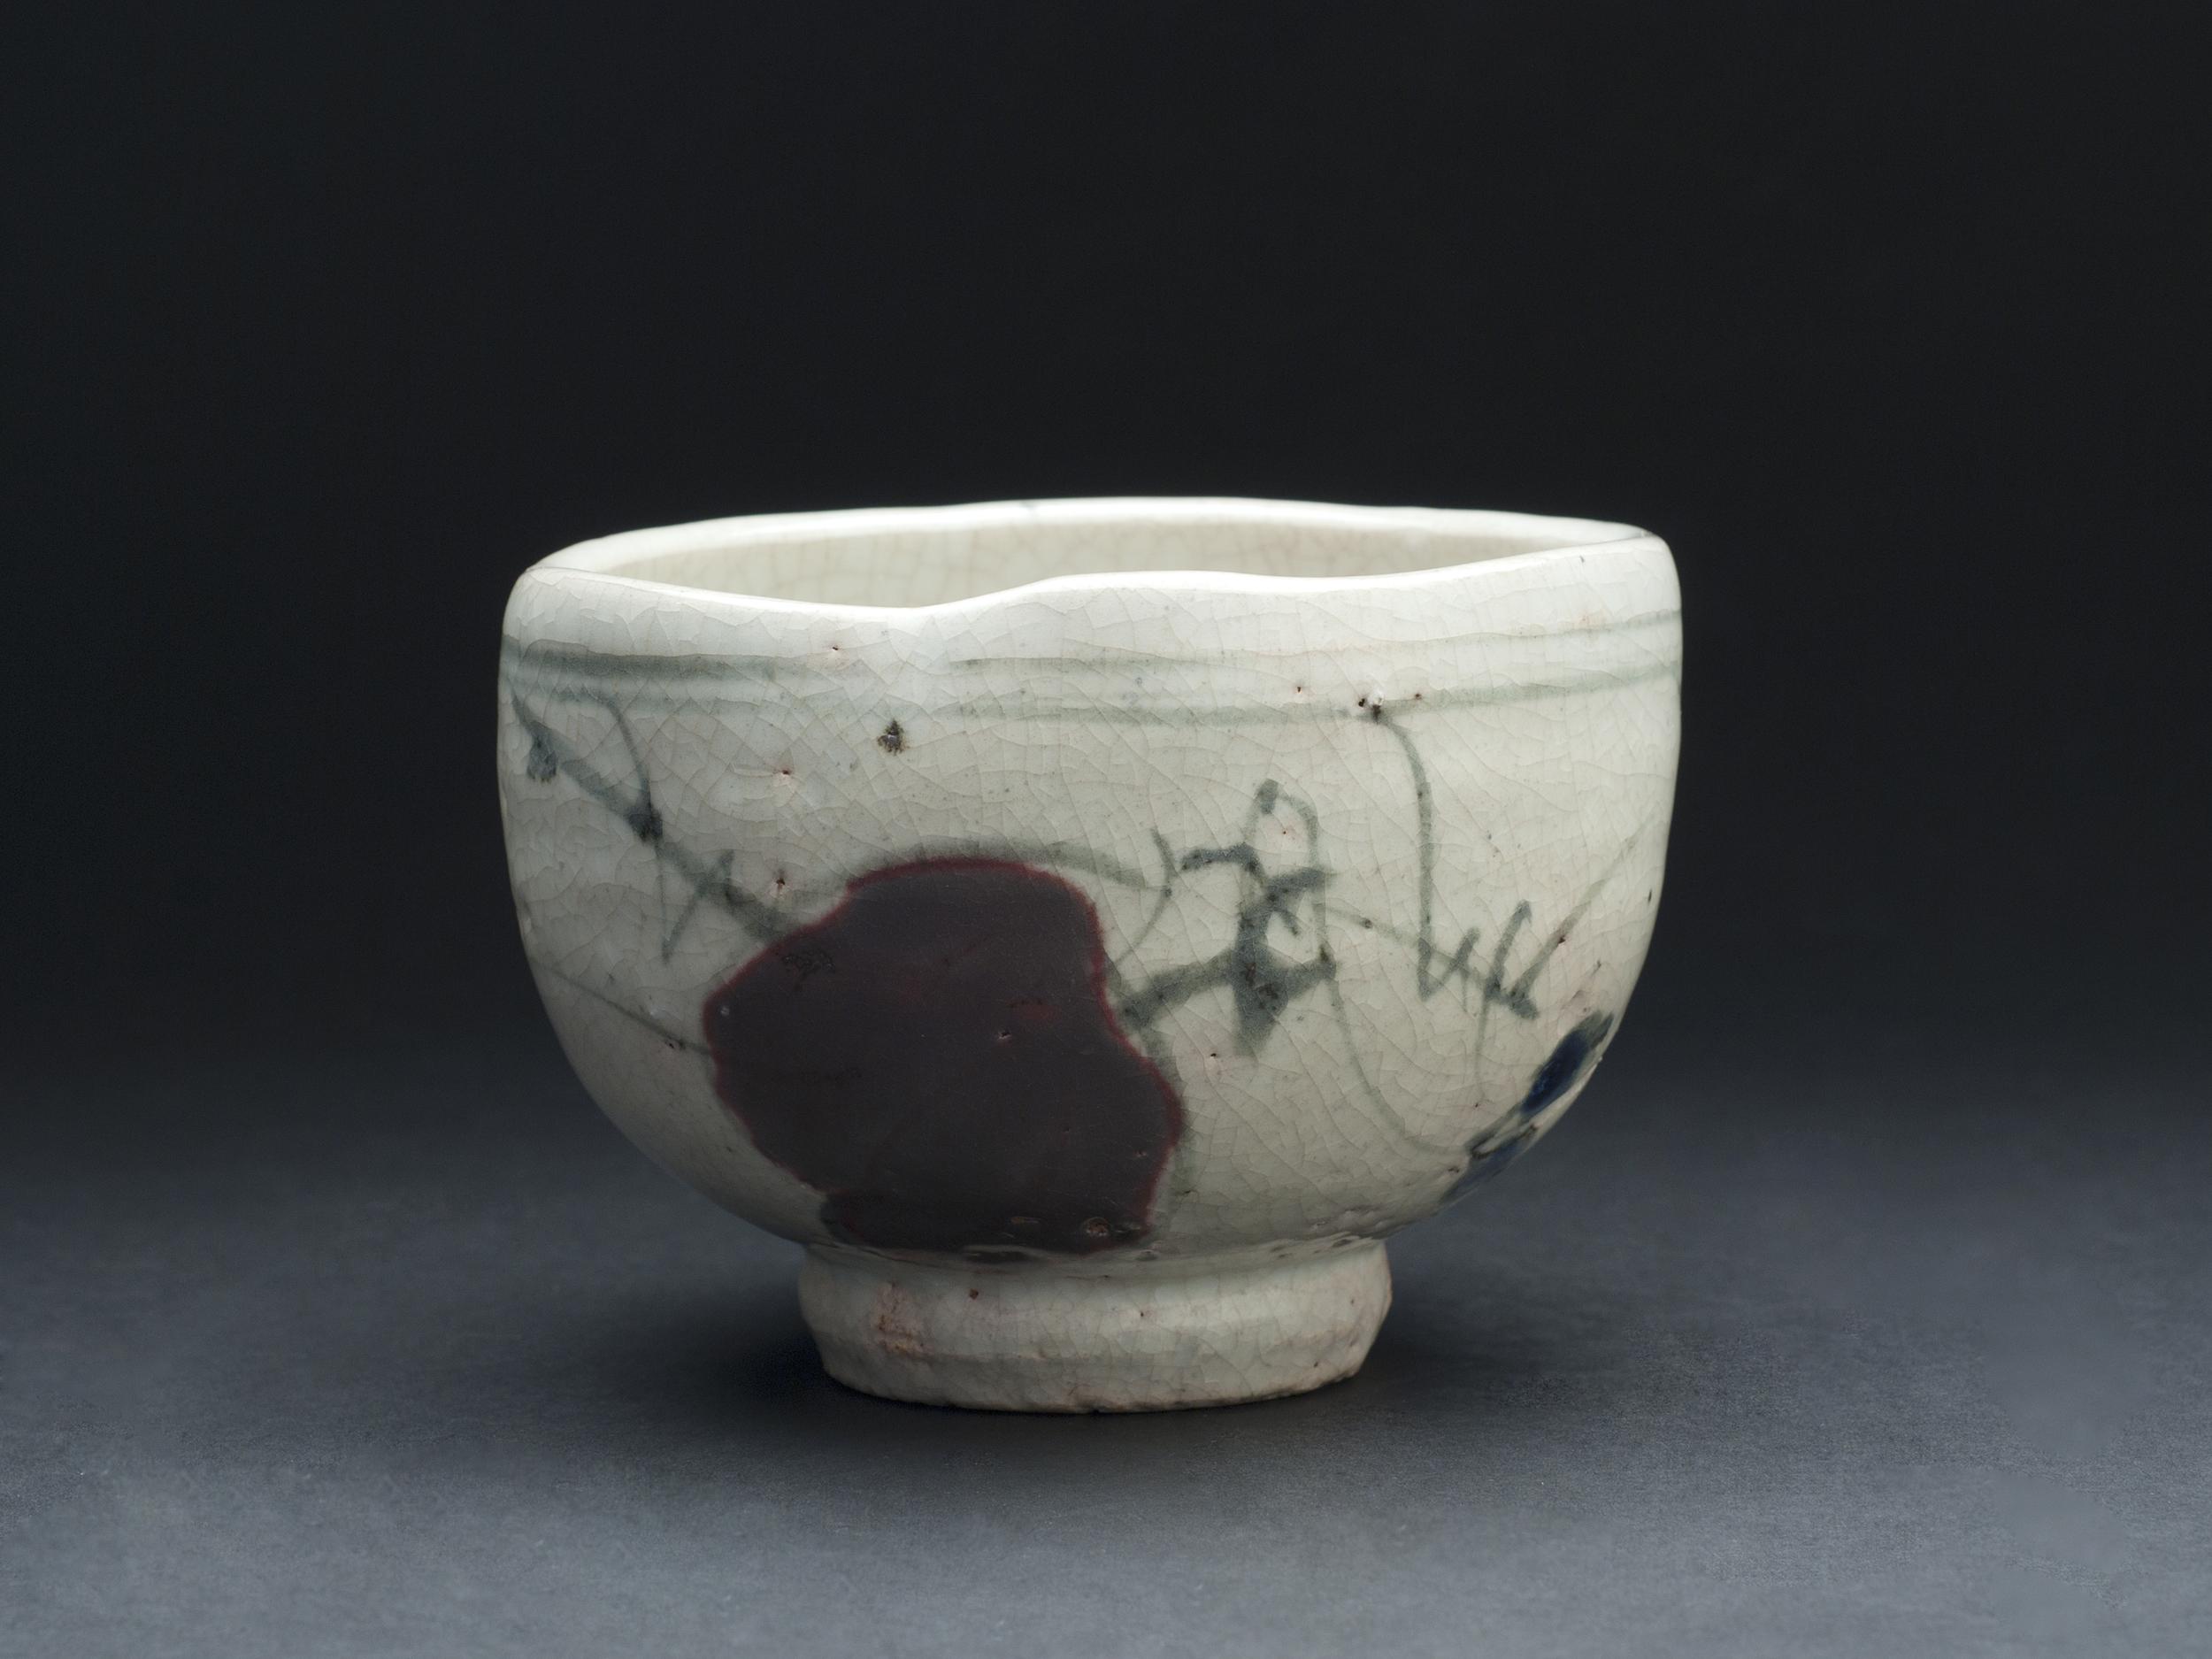 Tae Kwon Ryu    Cho Son Baek Cha Cho Hong Bun Chasabal  , 2008 Ceramic 4.5 x 6 inches 11.4 x 15.2 cm TKR 1